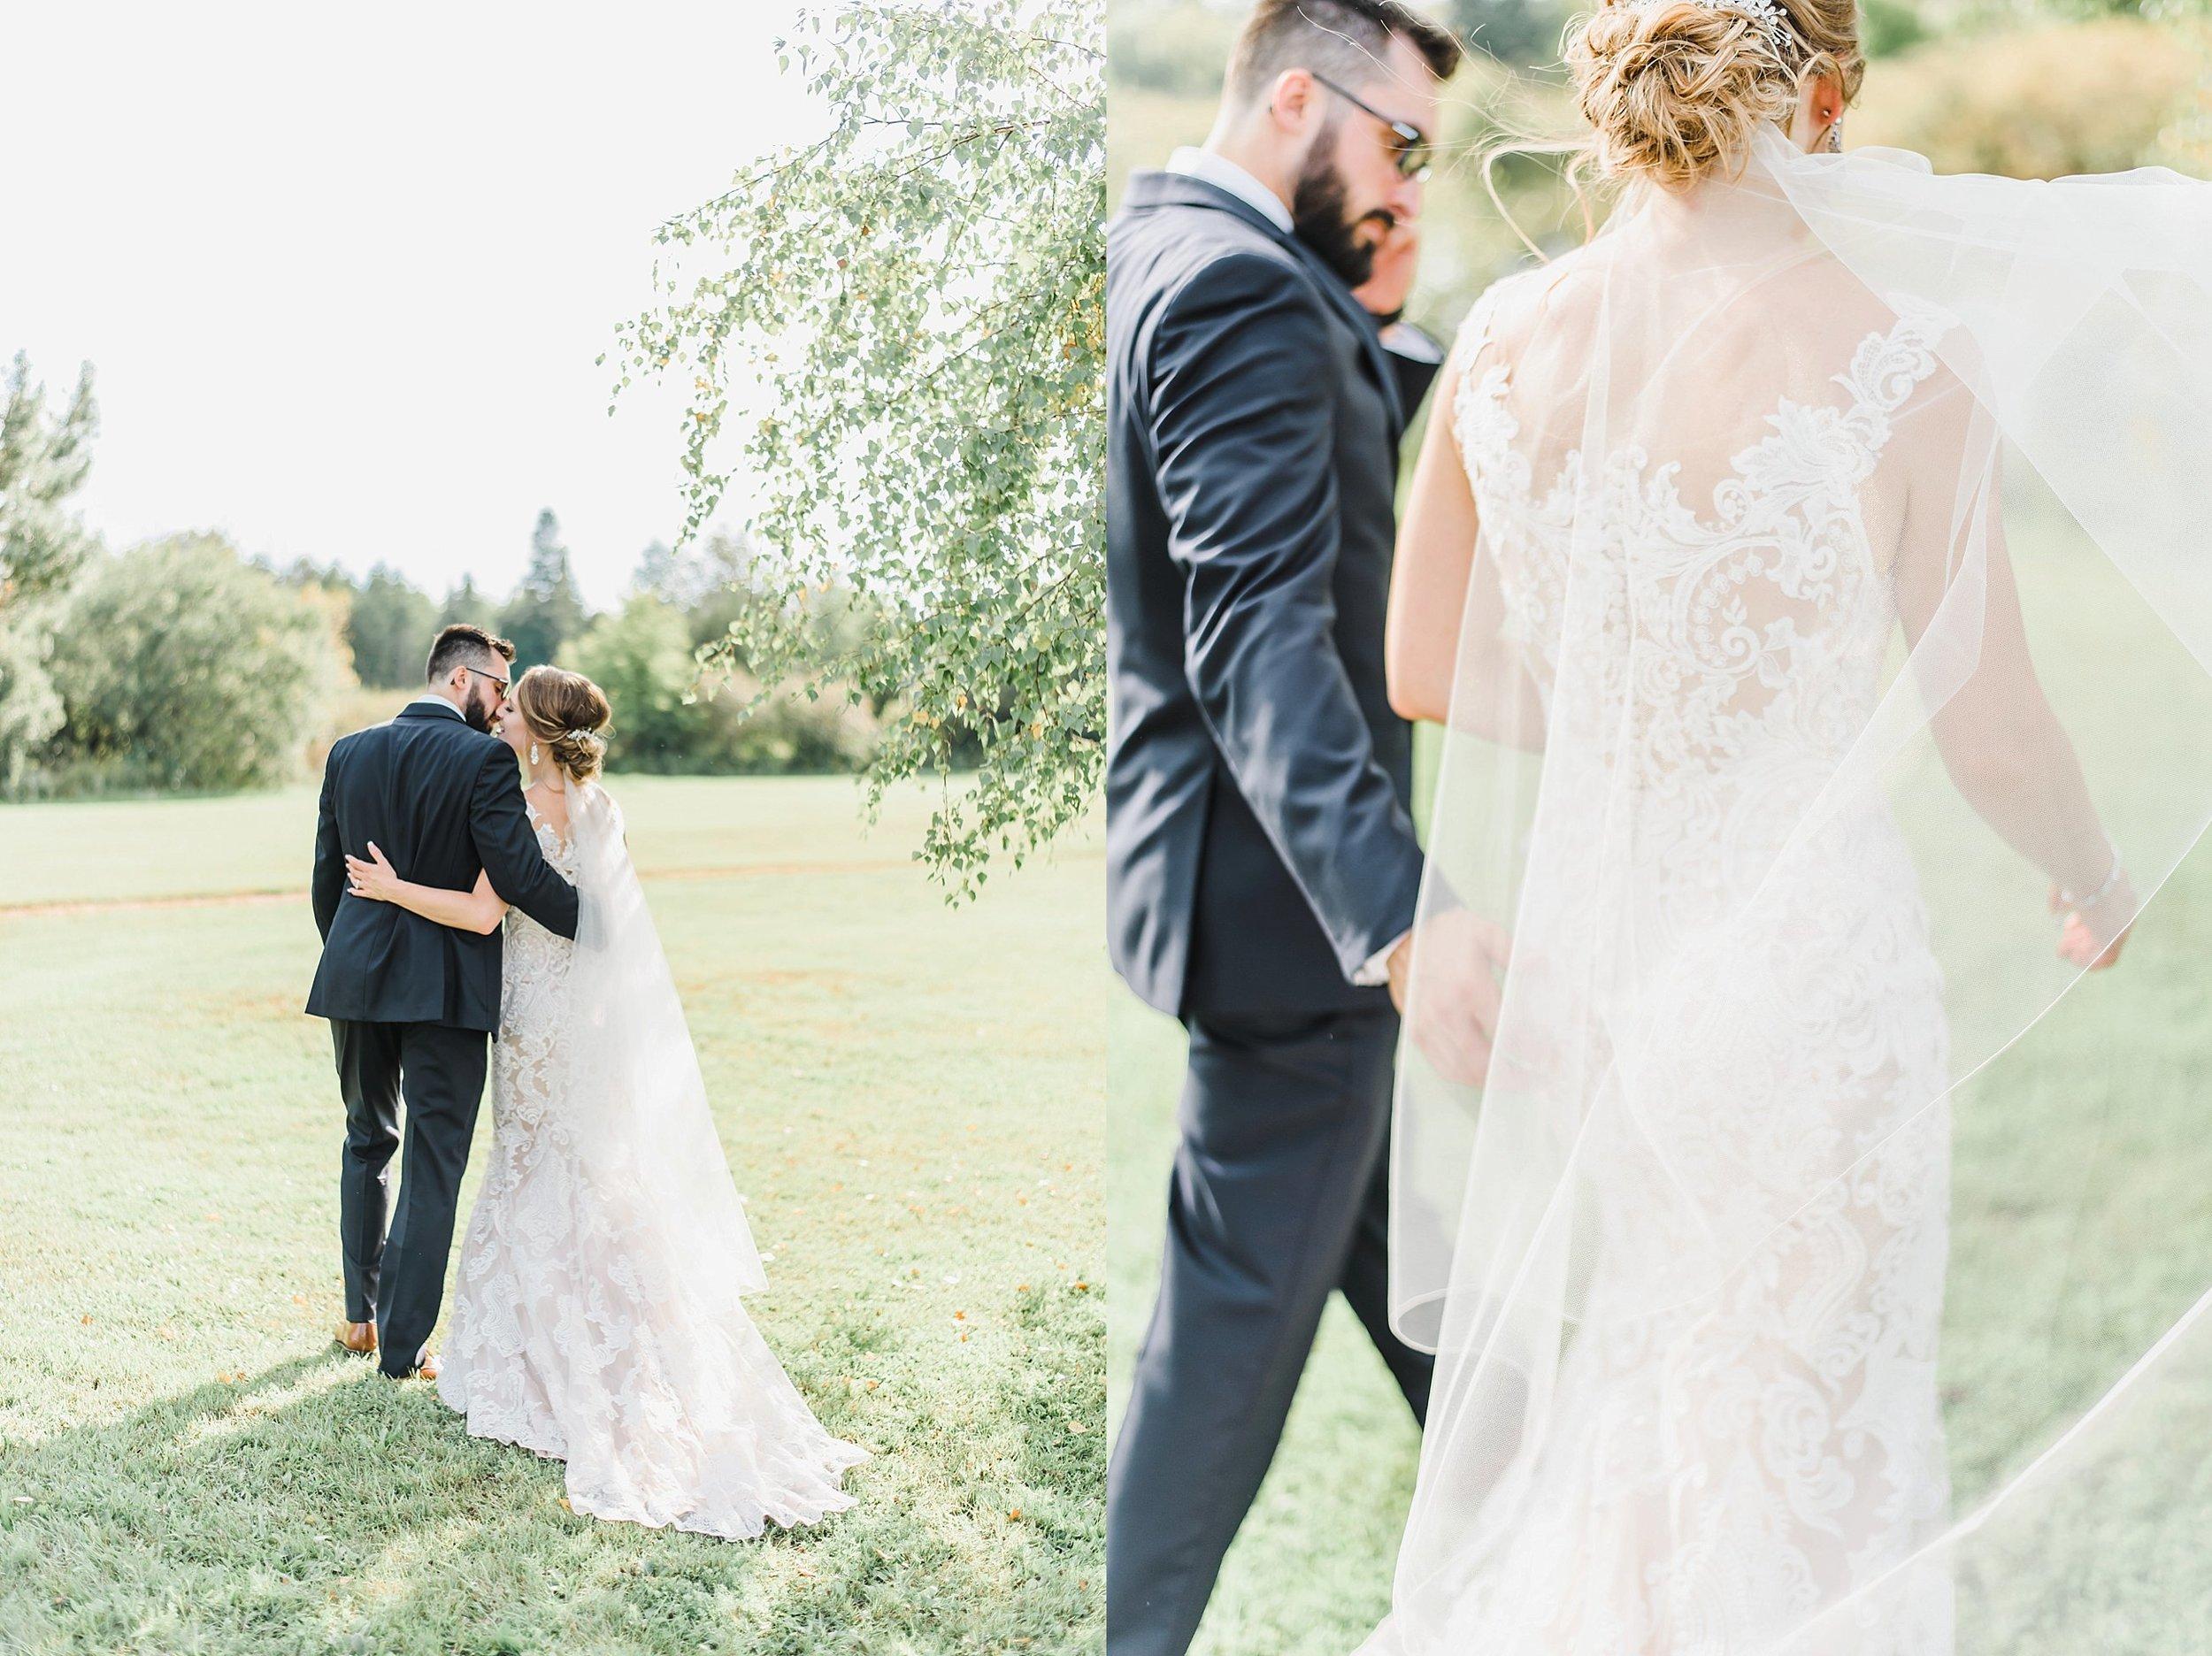 light airy indie fine art ottawa wedding photographer | Ali and Batoul Photography_1305.jpg